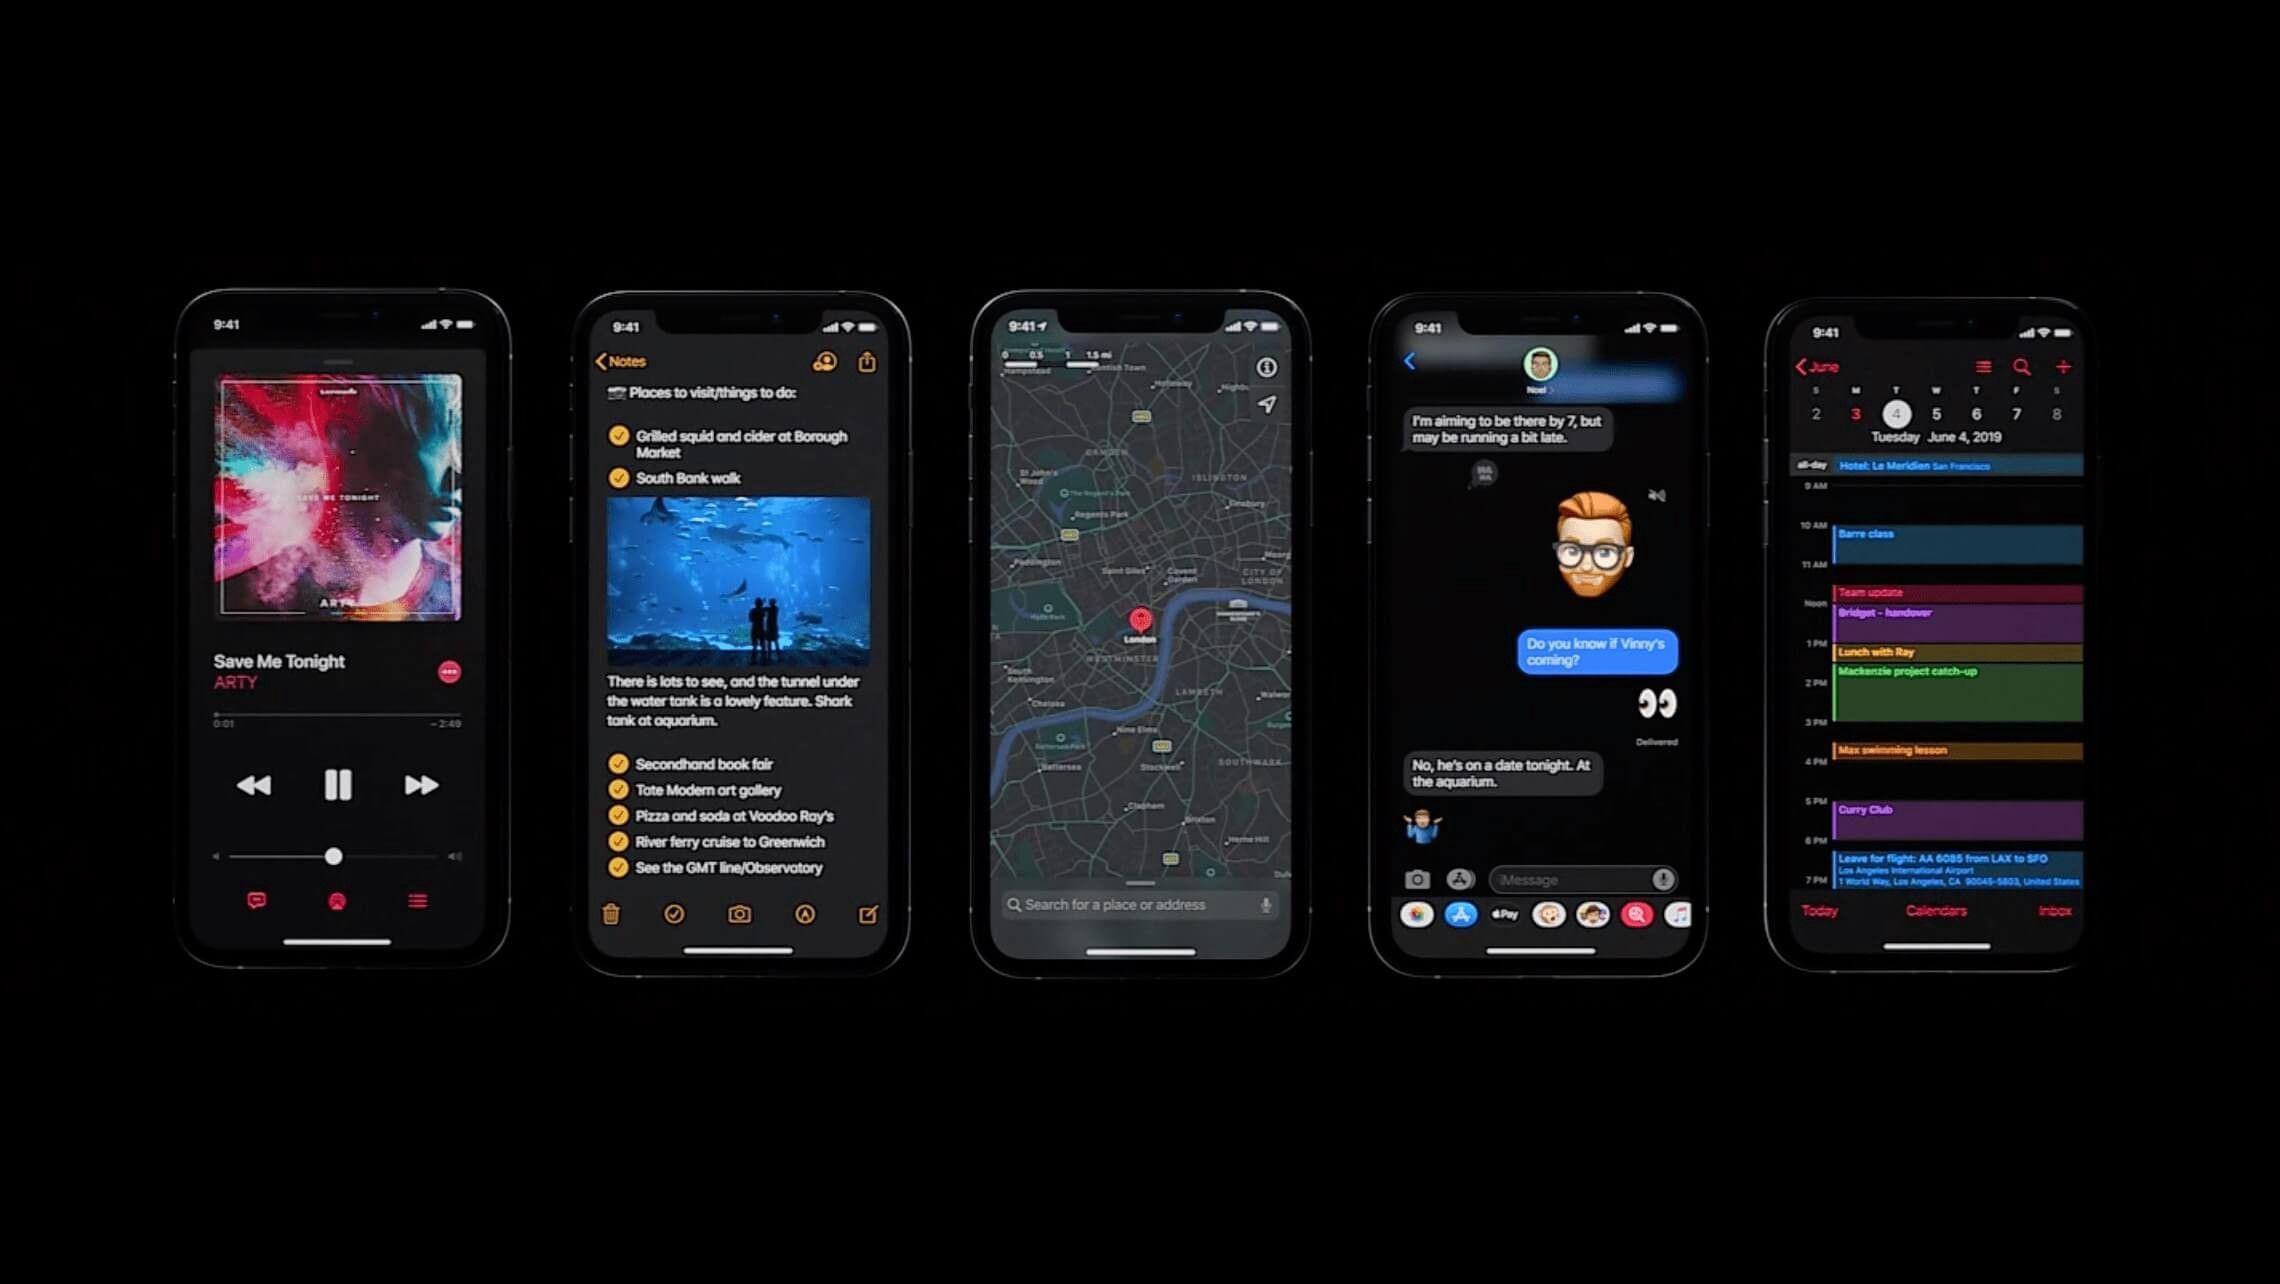 Facebook Messenger on Dark Mode in 2020 Iphone, Apple